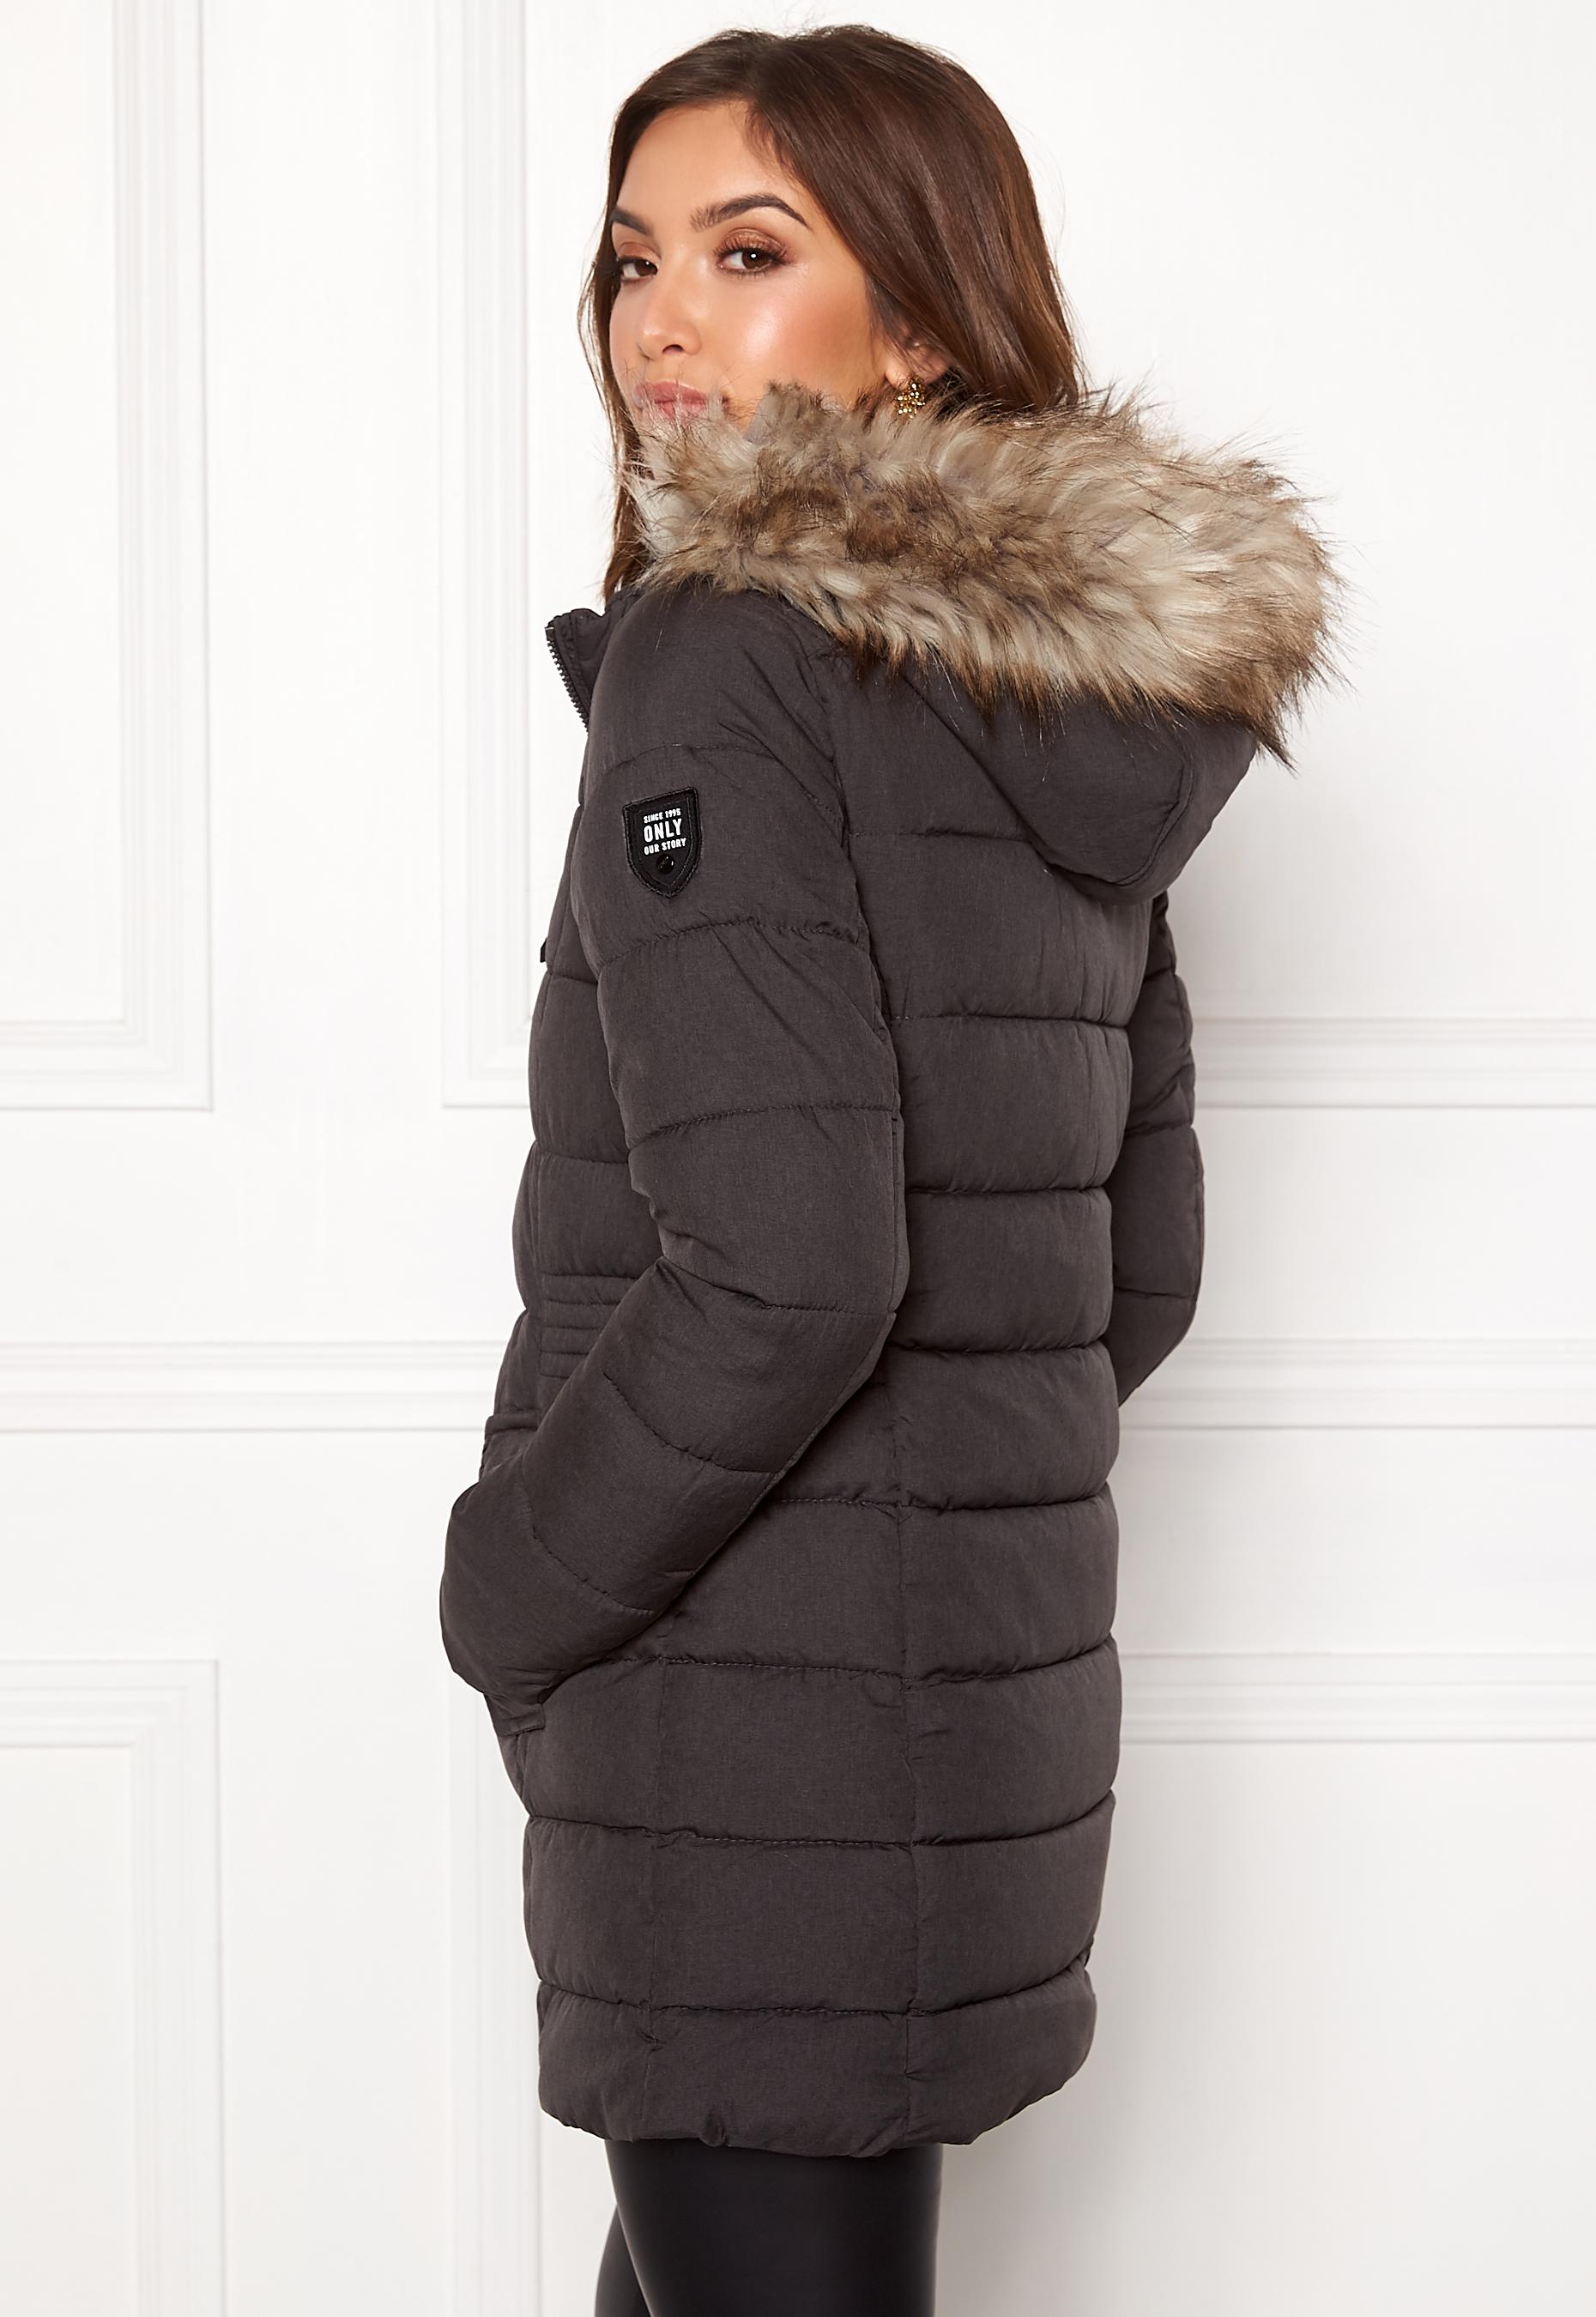 61bafb5d ONLY North Nylon Coat Black - Bubbleroom